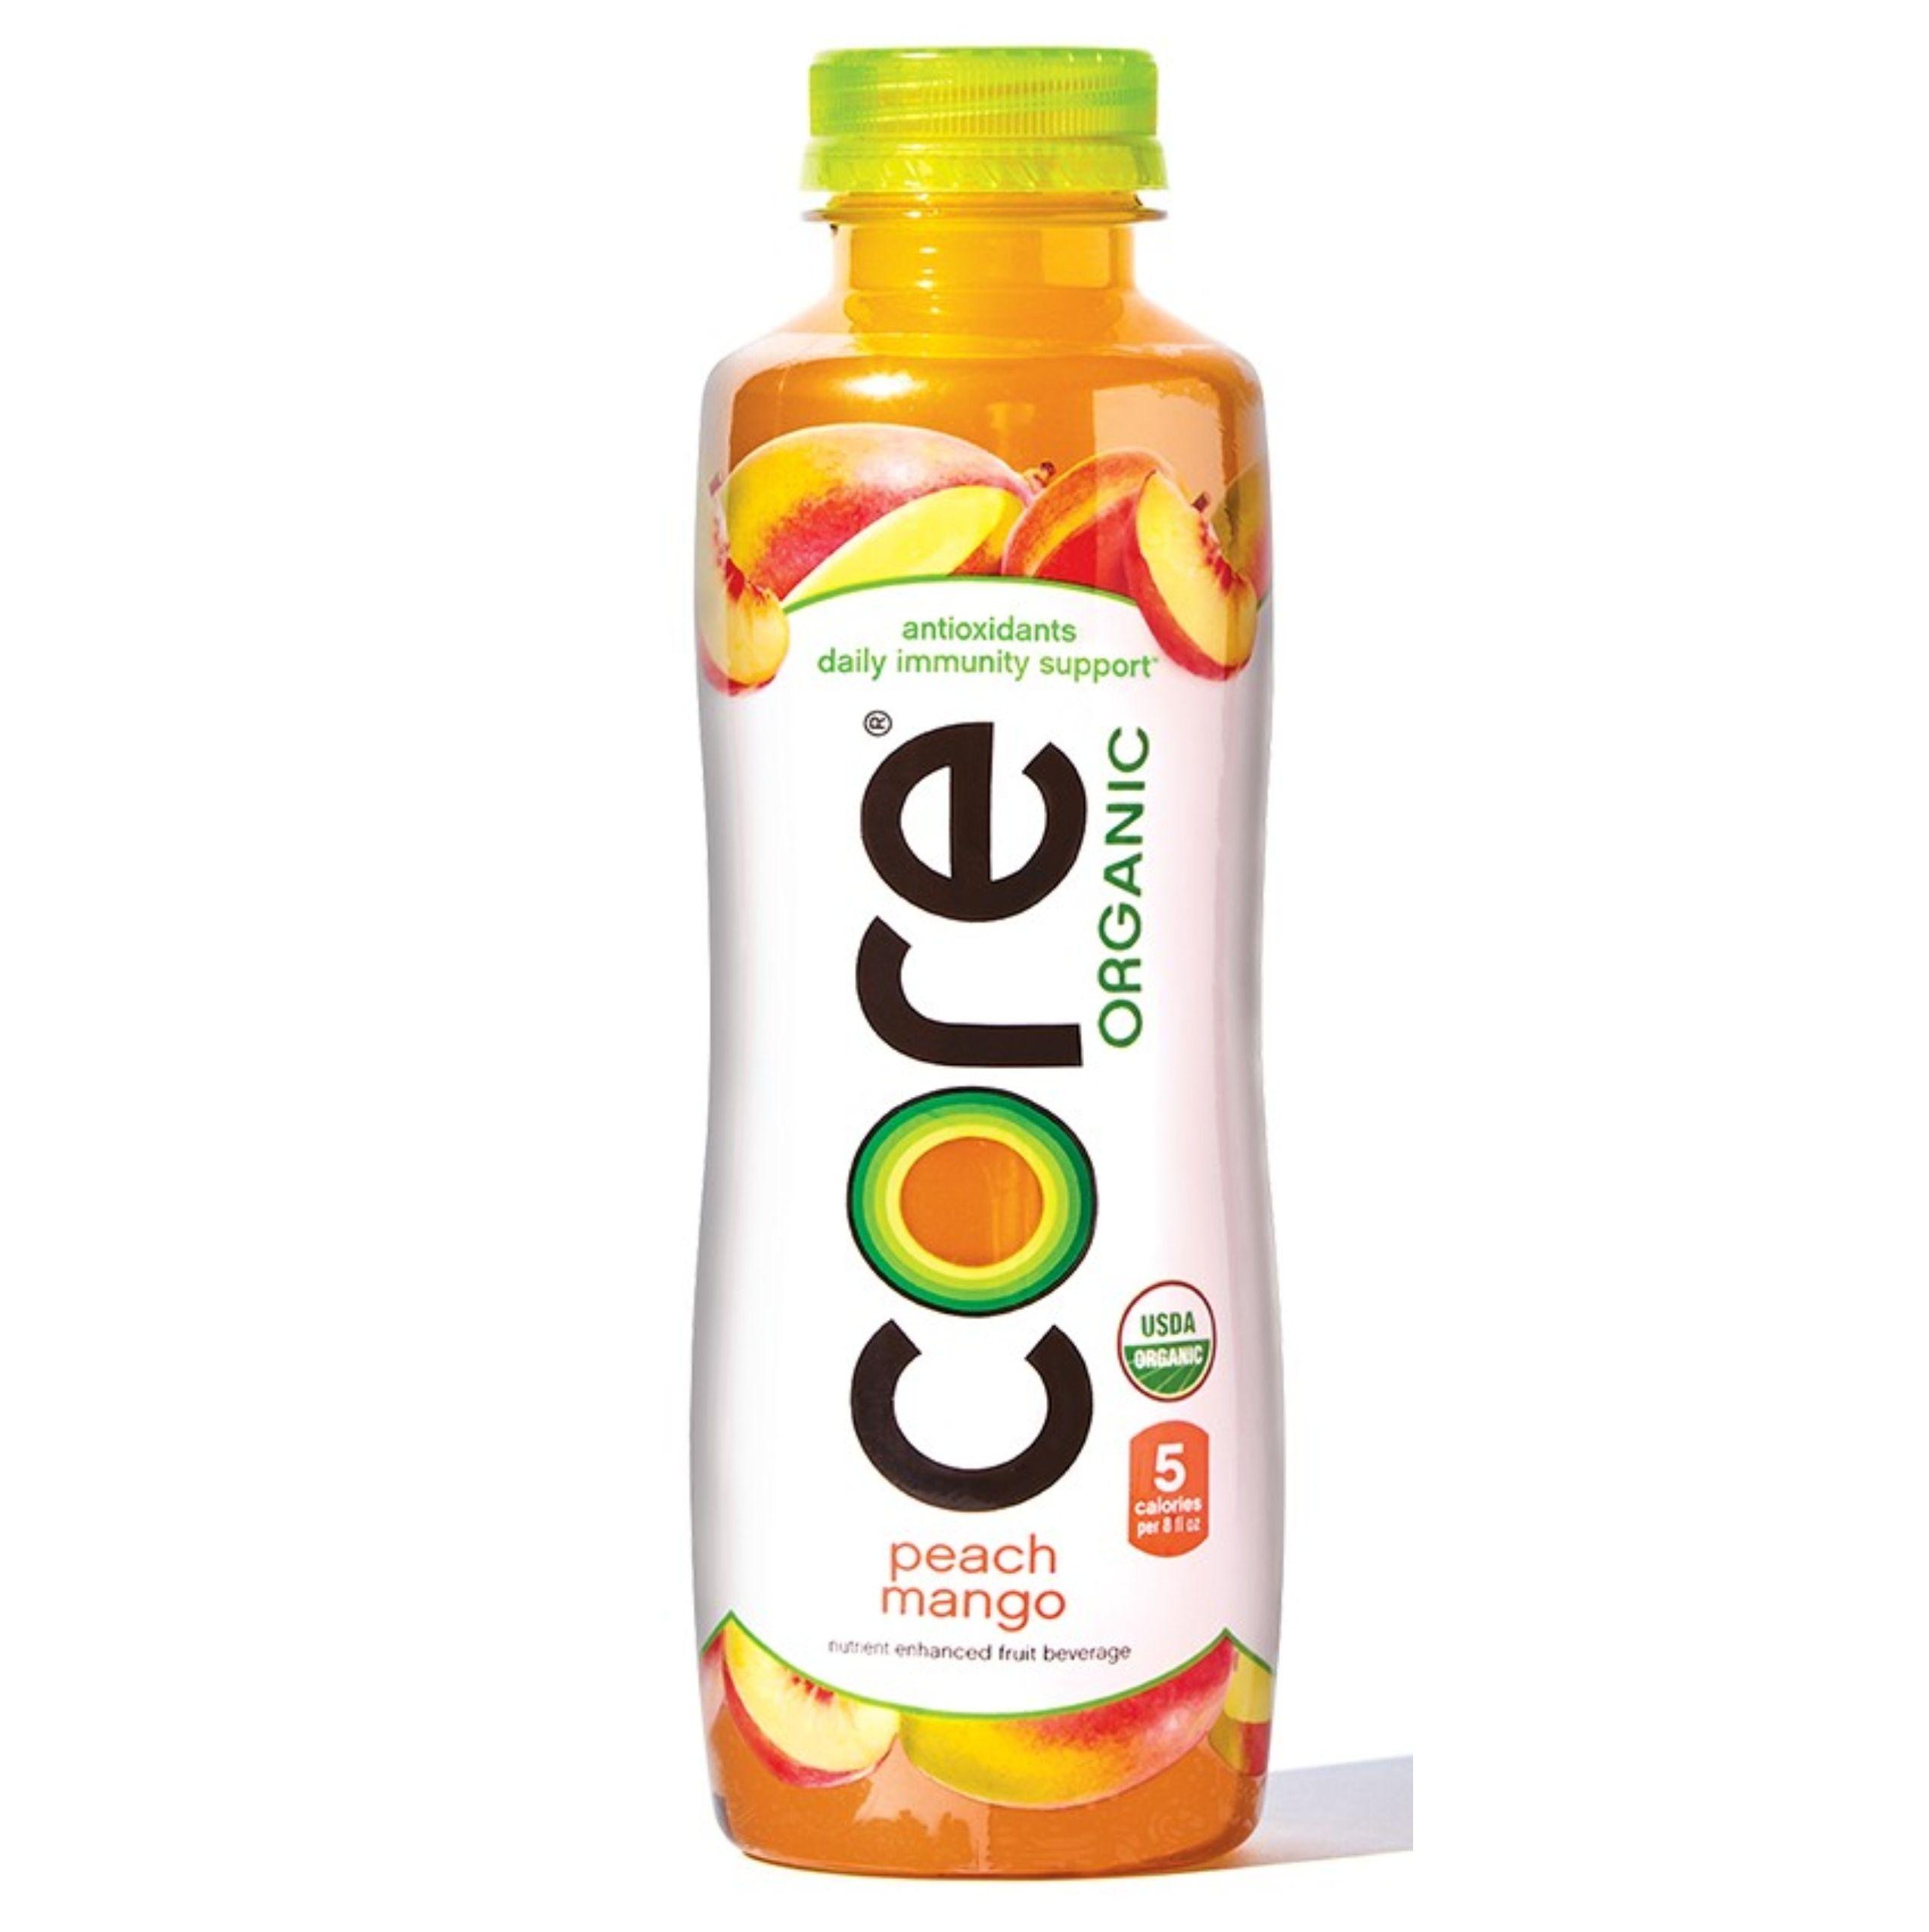 Core Organic peach mango